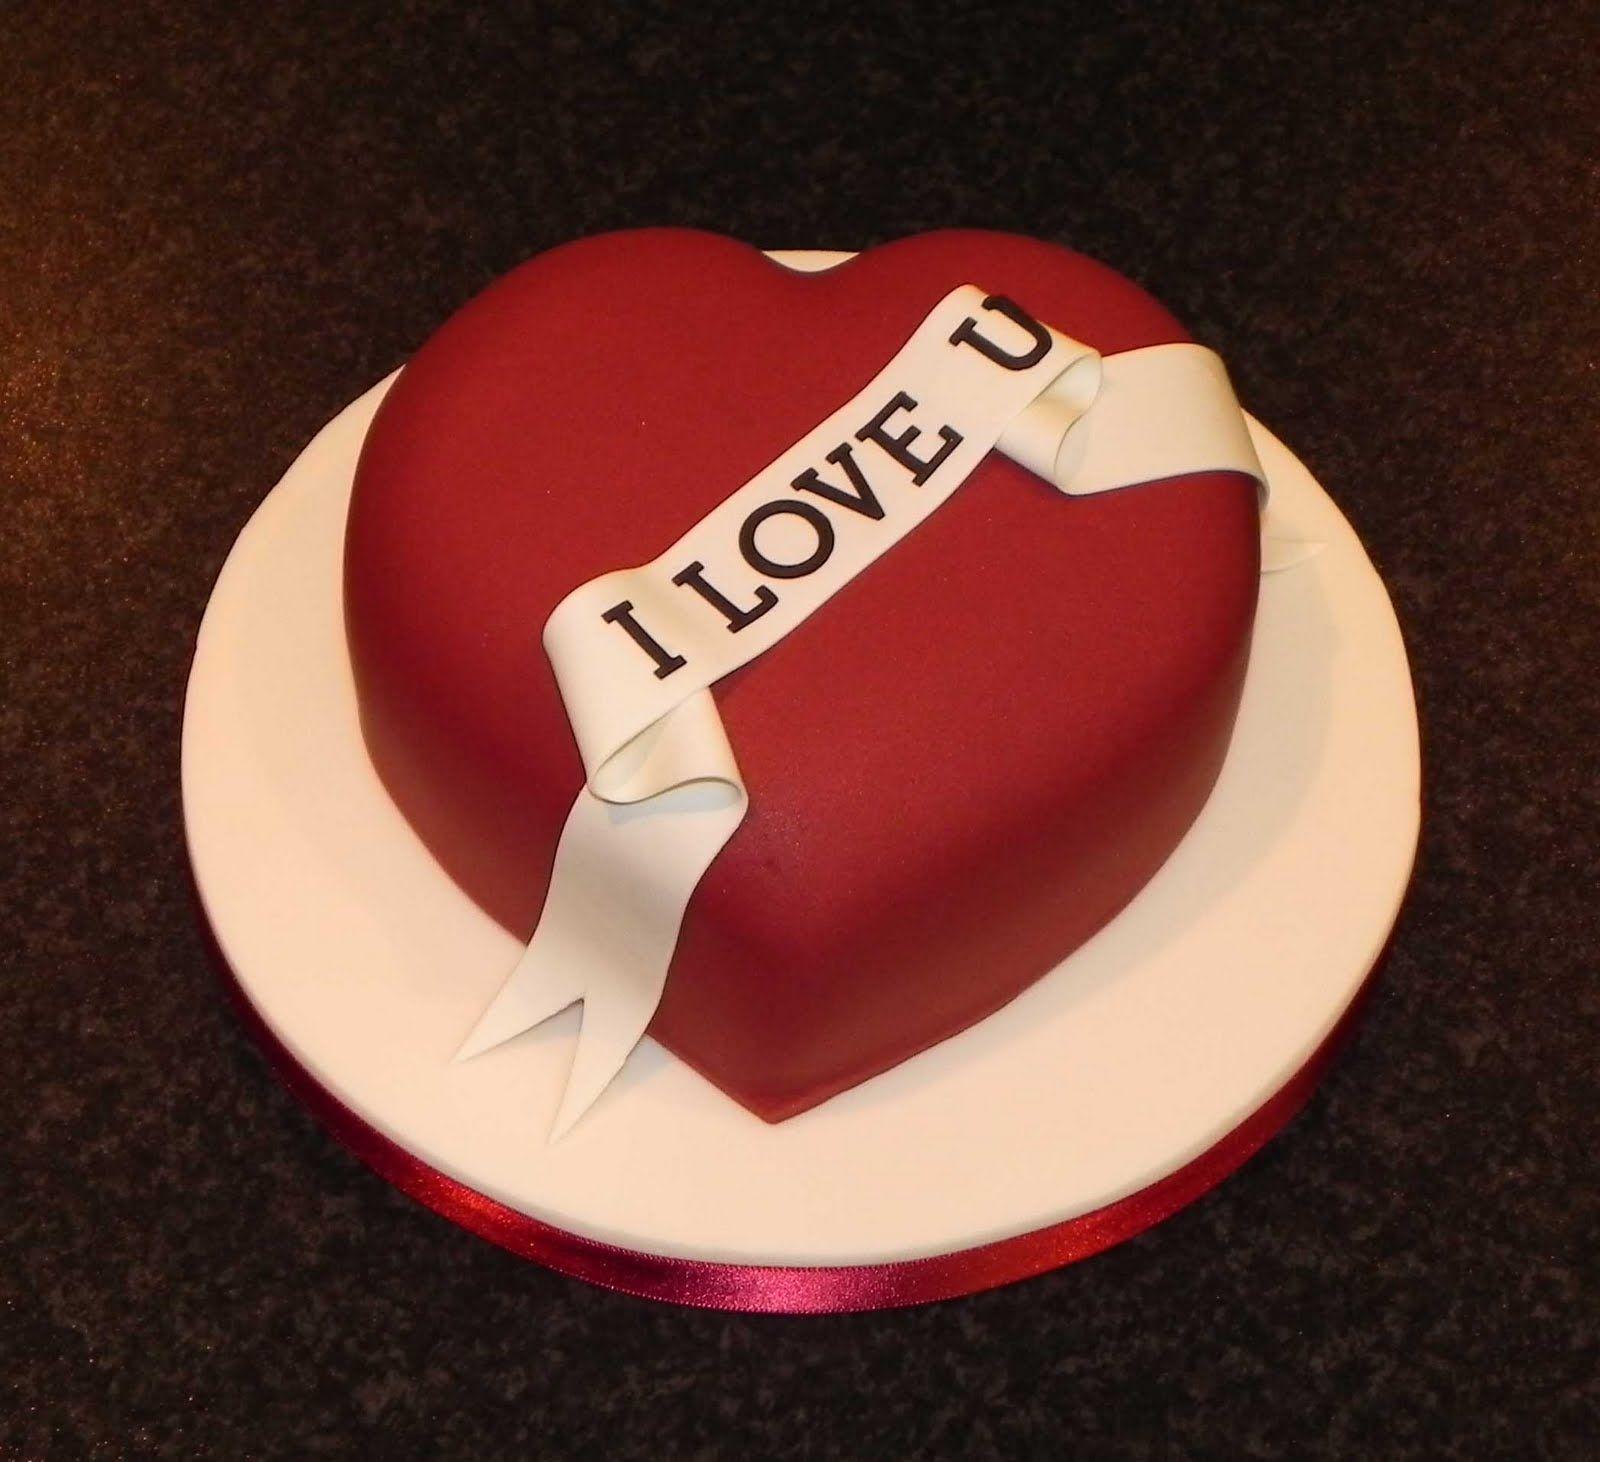 Red And Black Heart Heart Shaped Birthday Cake Valentine Cake